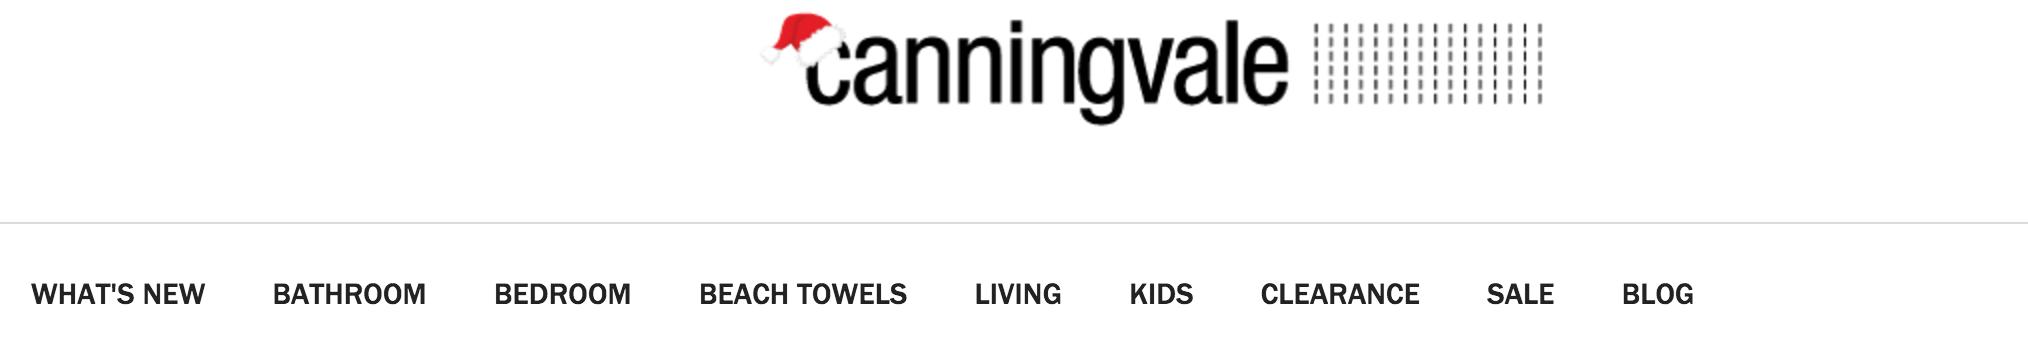 Canningvale Header Menu